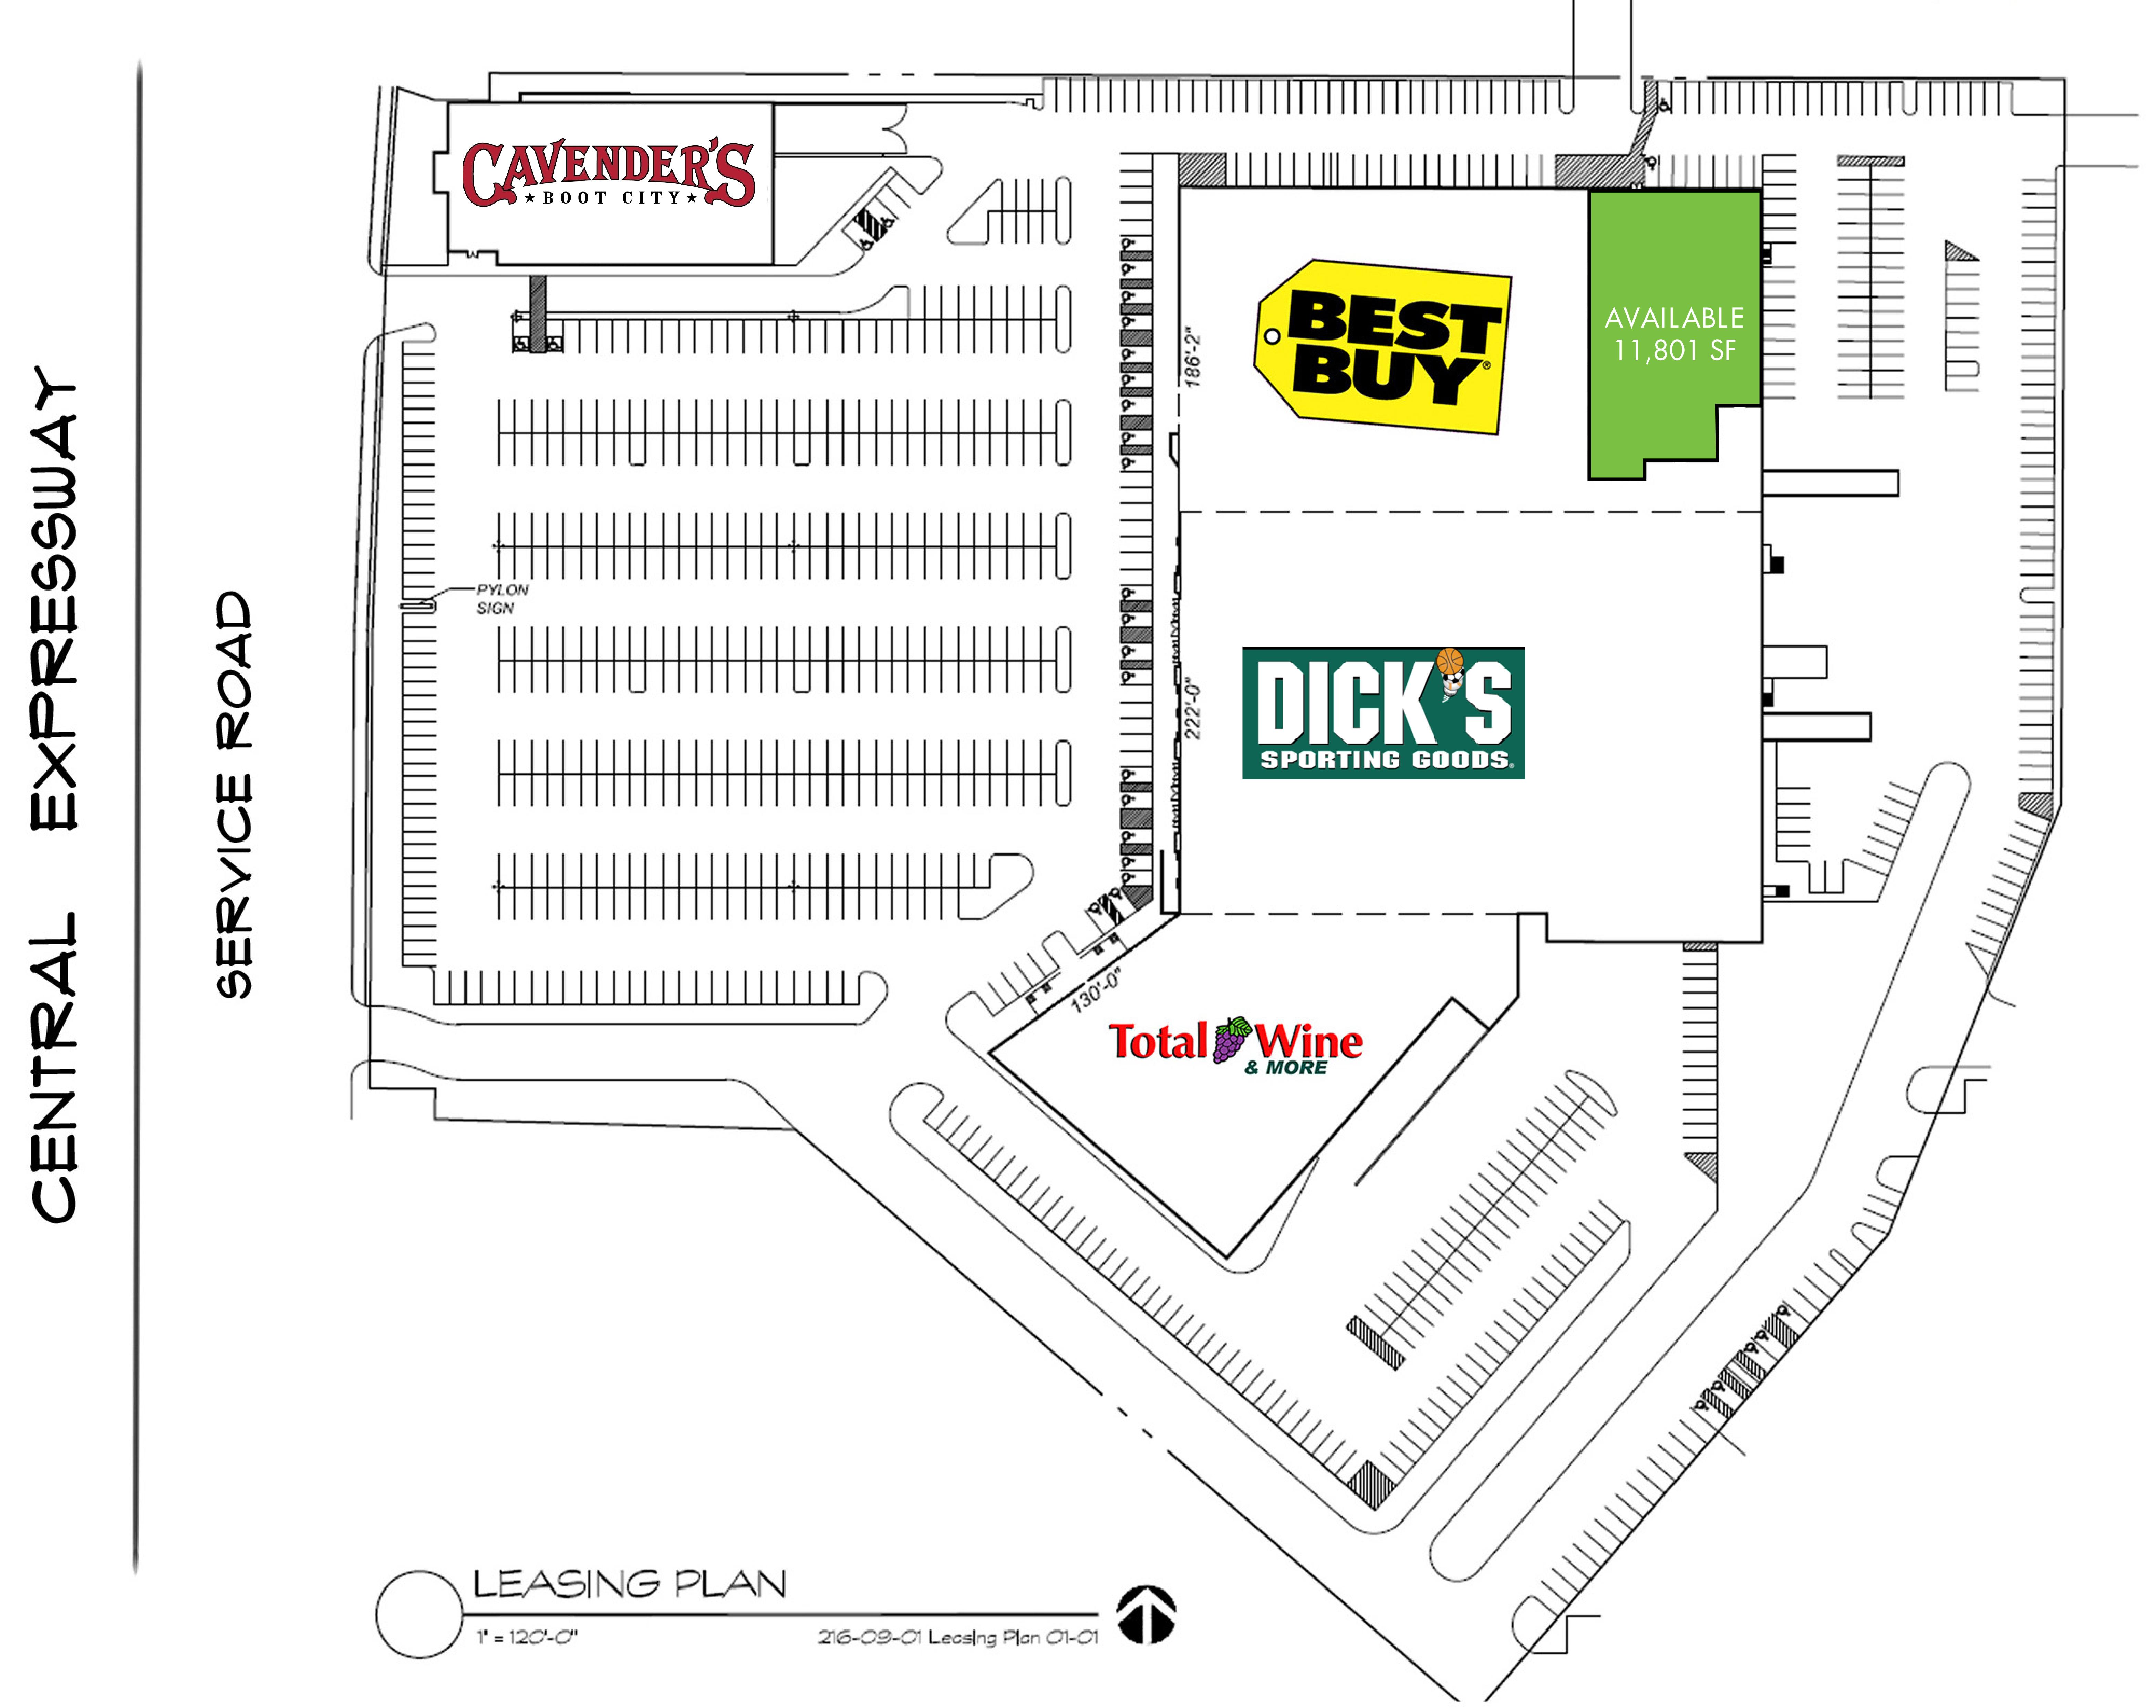 Best Buy Plaza: site plan